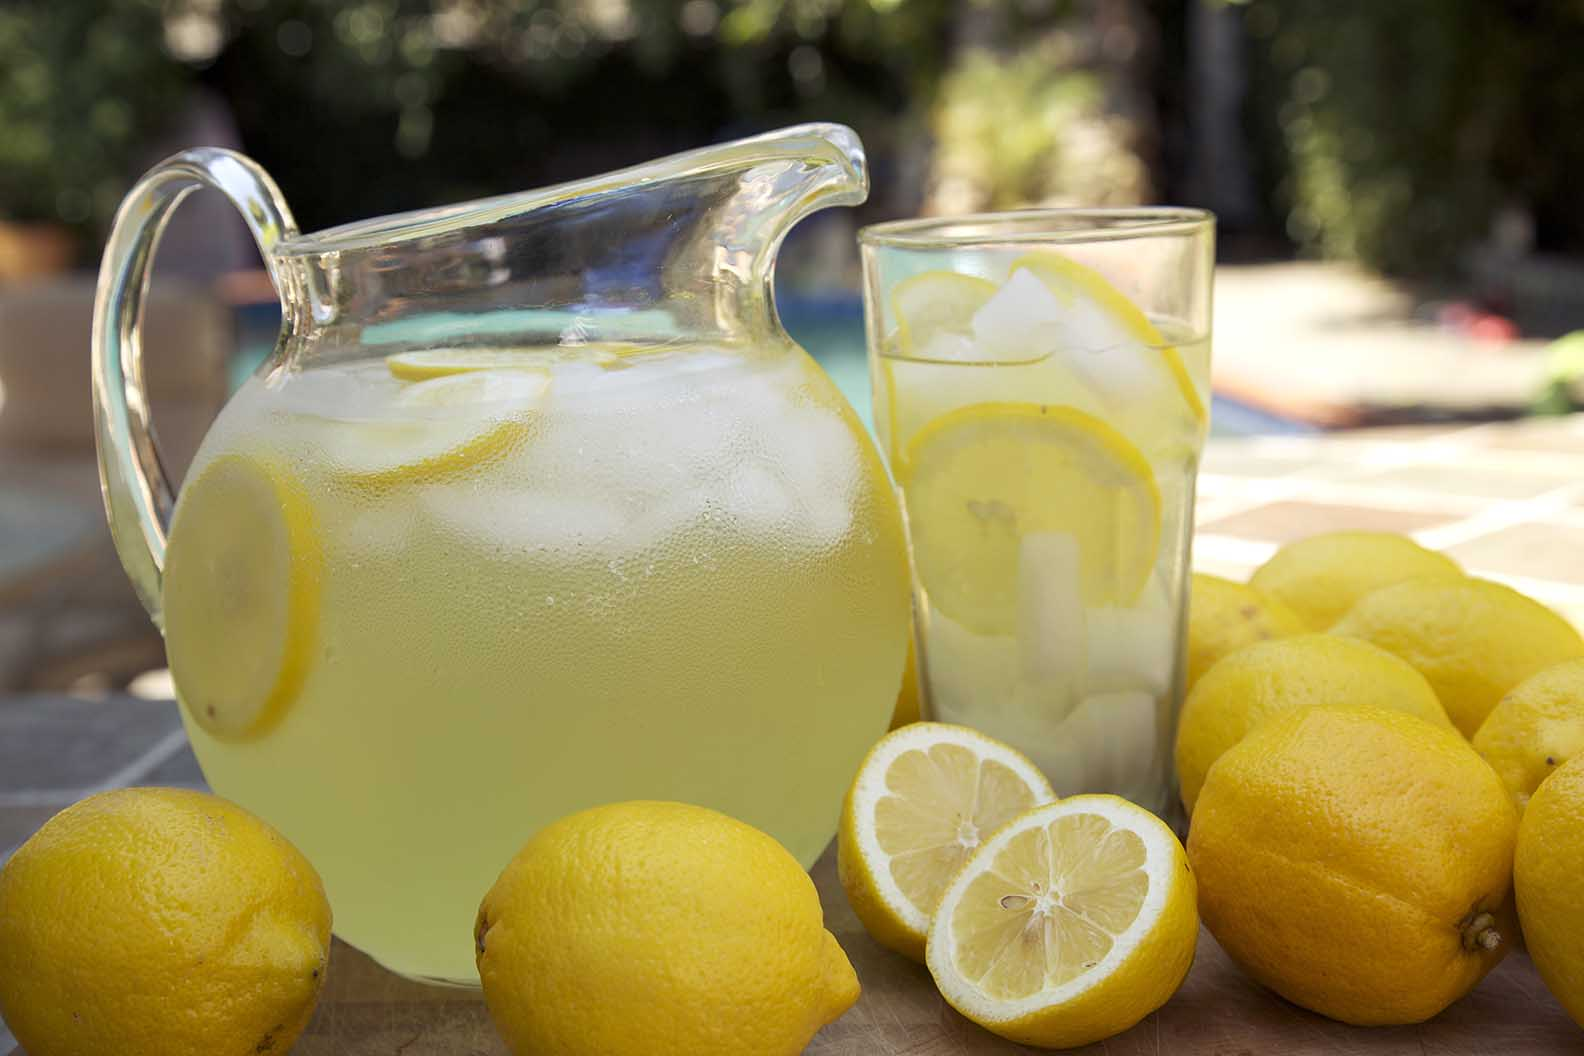 Strawberry Lemonade Pitcher | Just Dough It! |Real Pitcher Of Lemonade